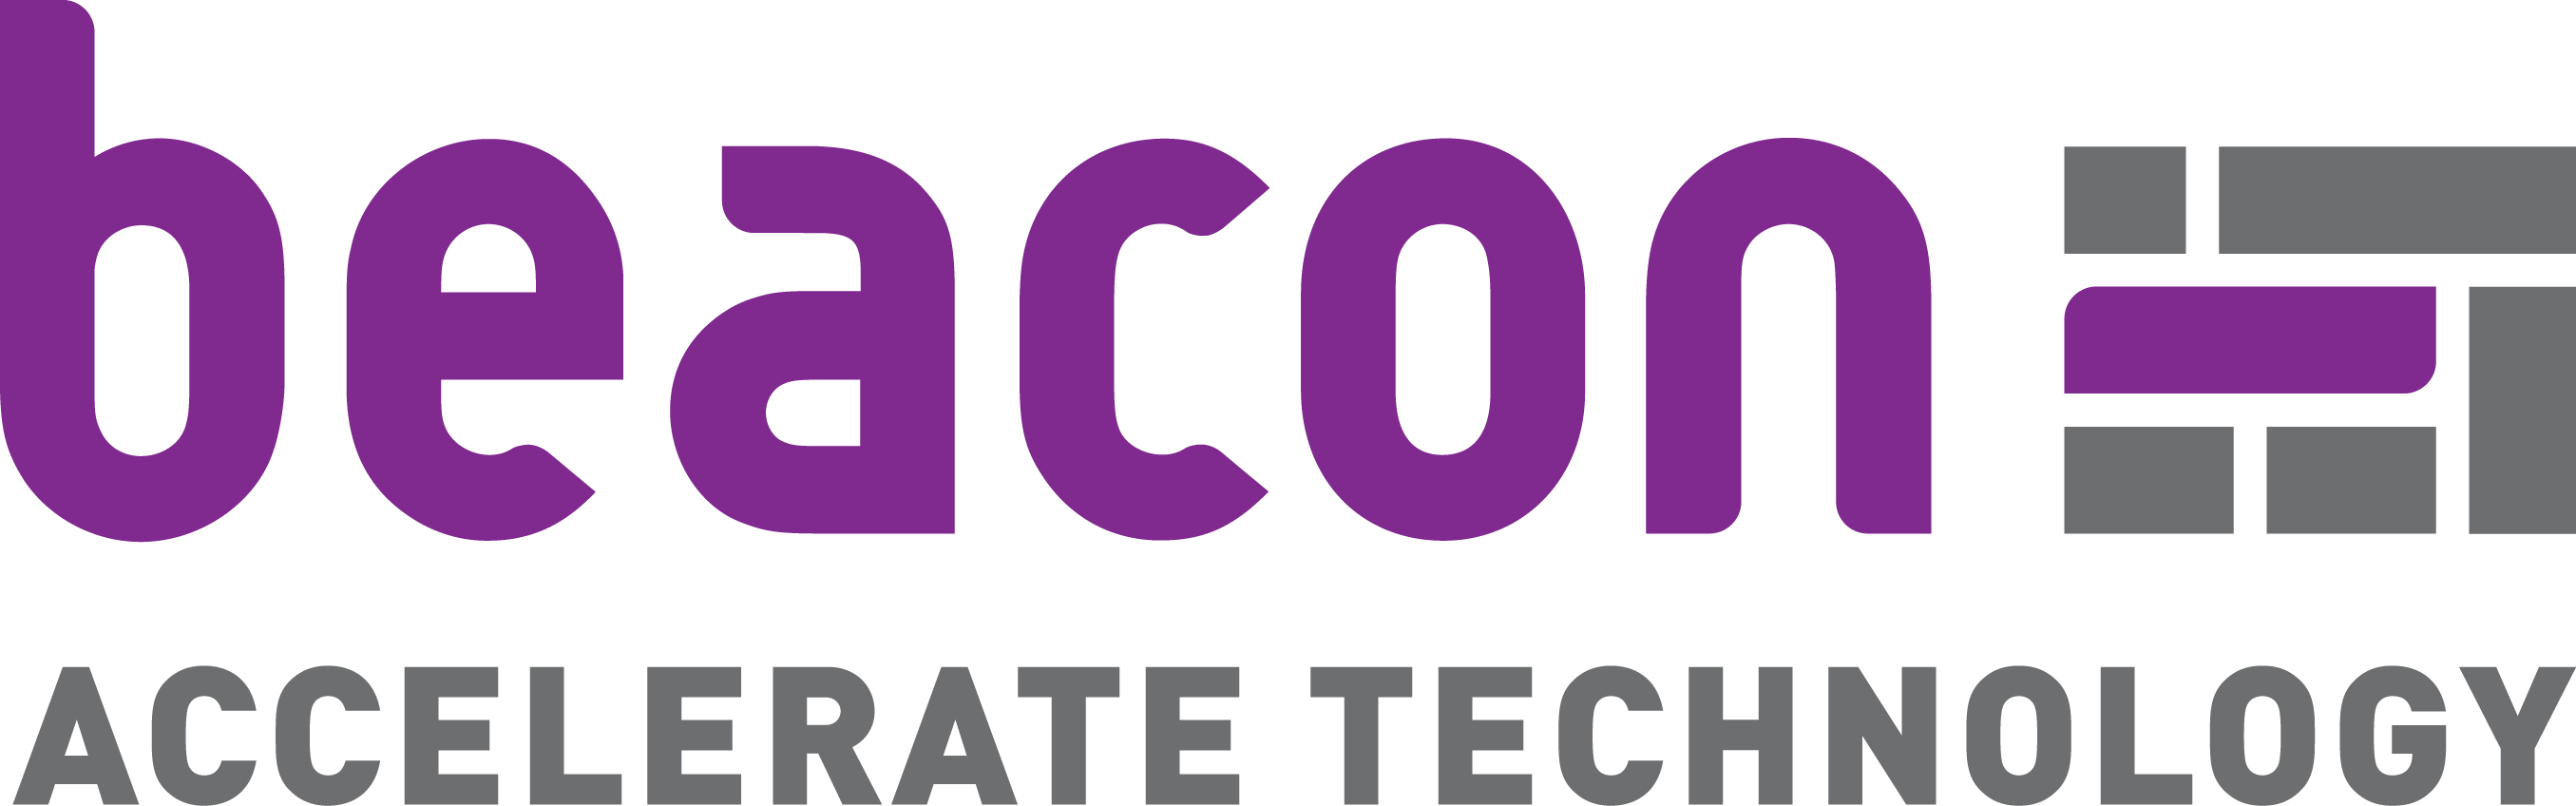 Careers | Beacon Platfom Inc